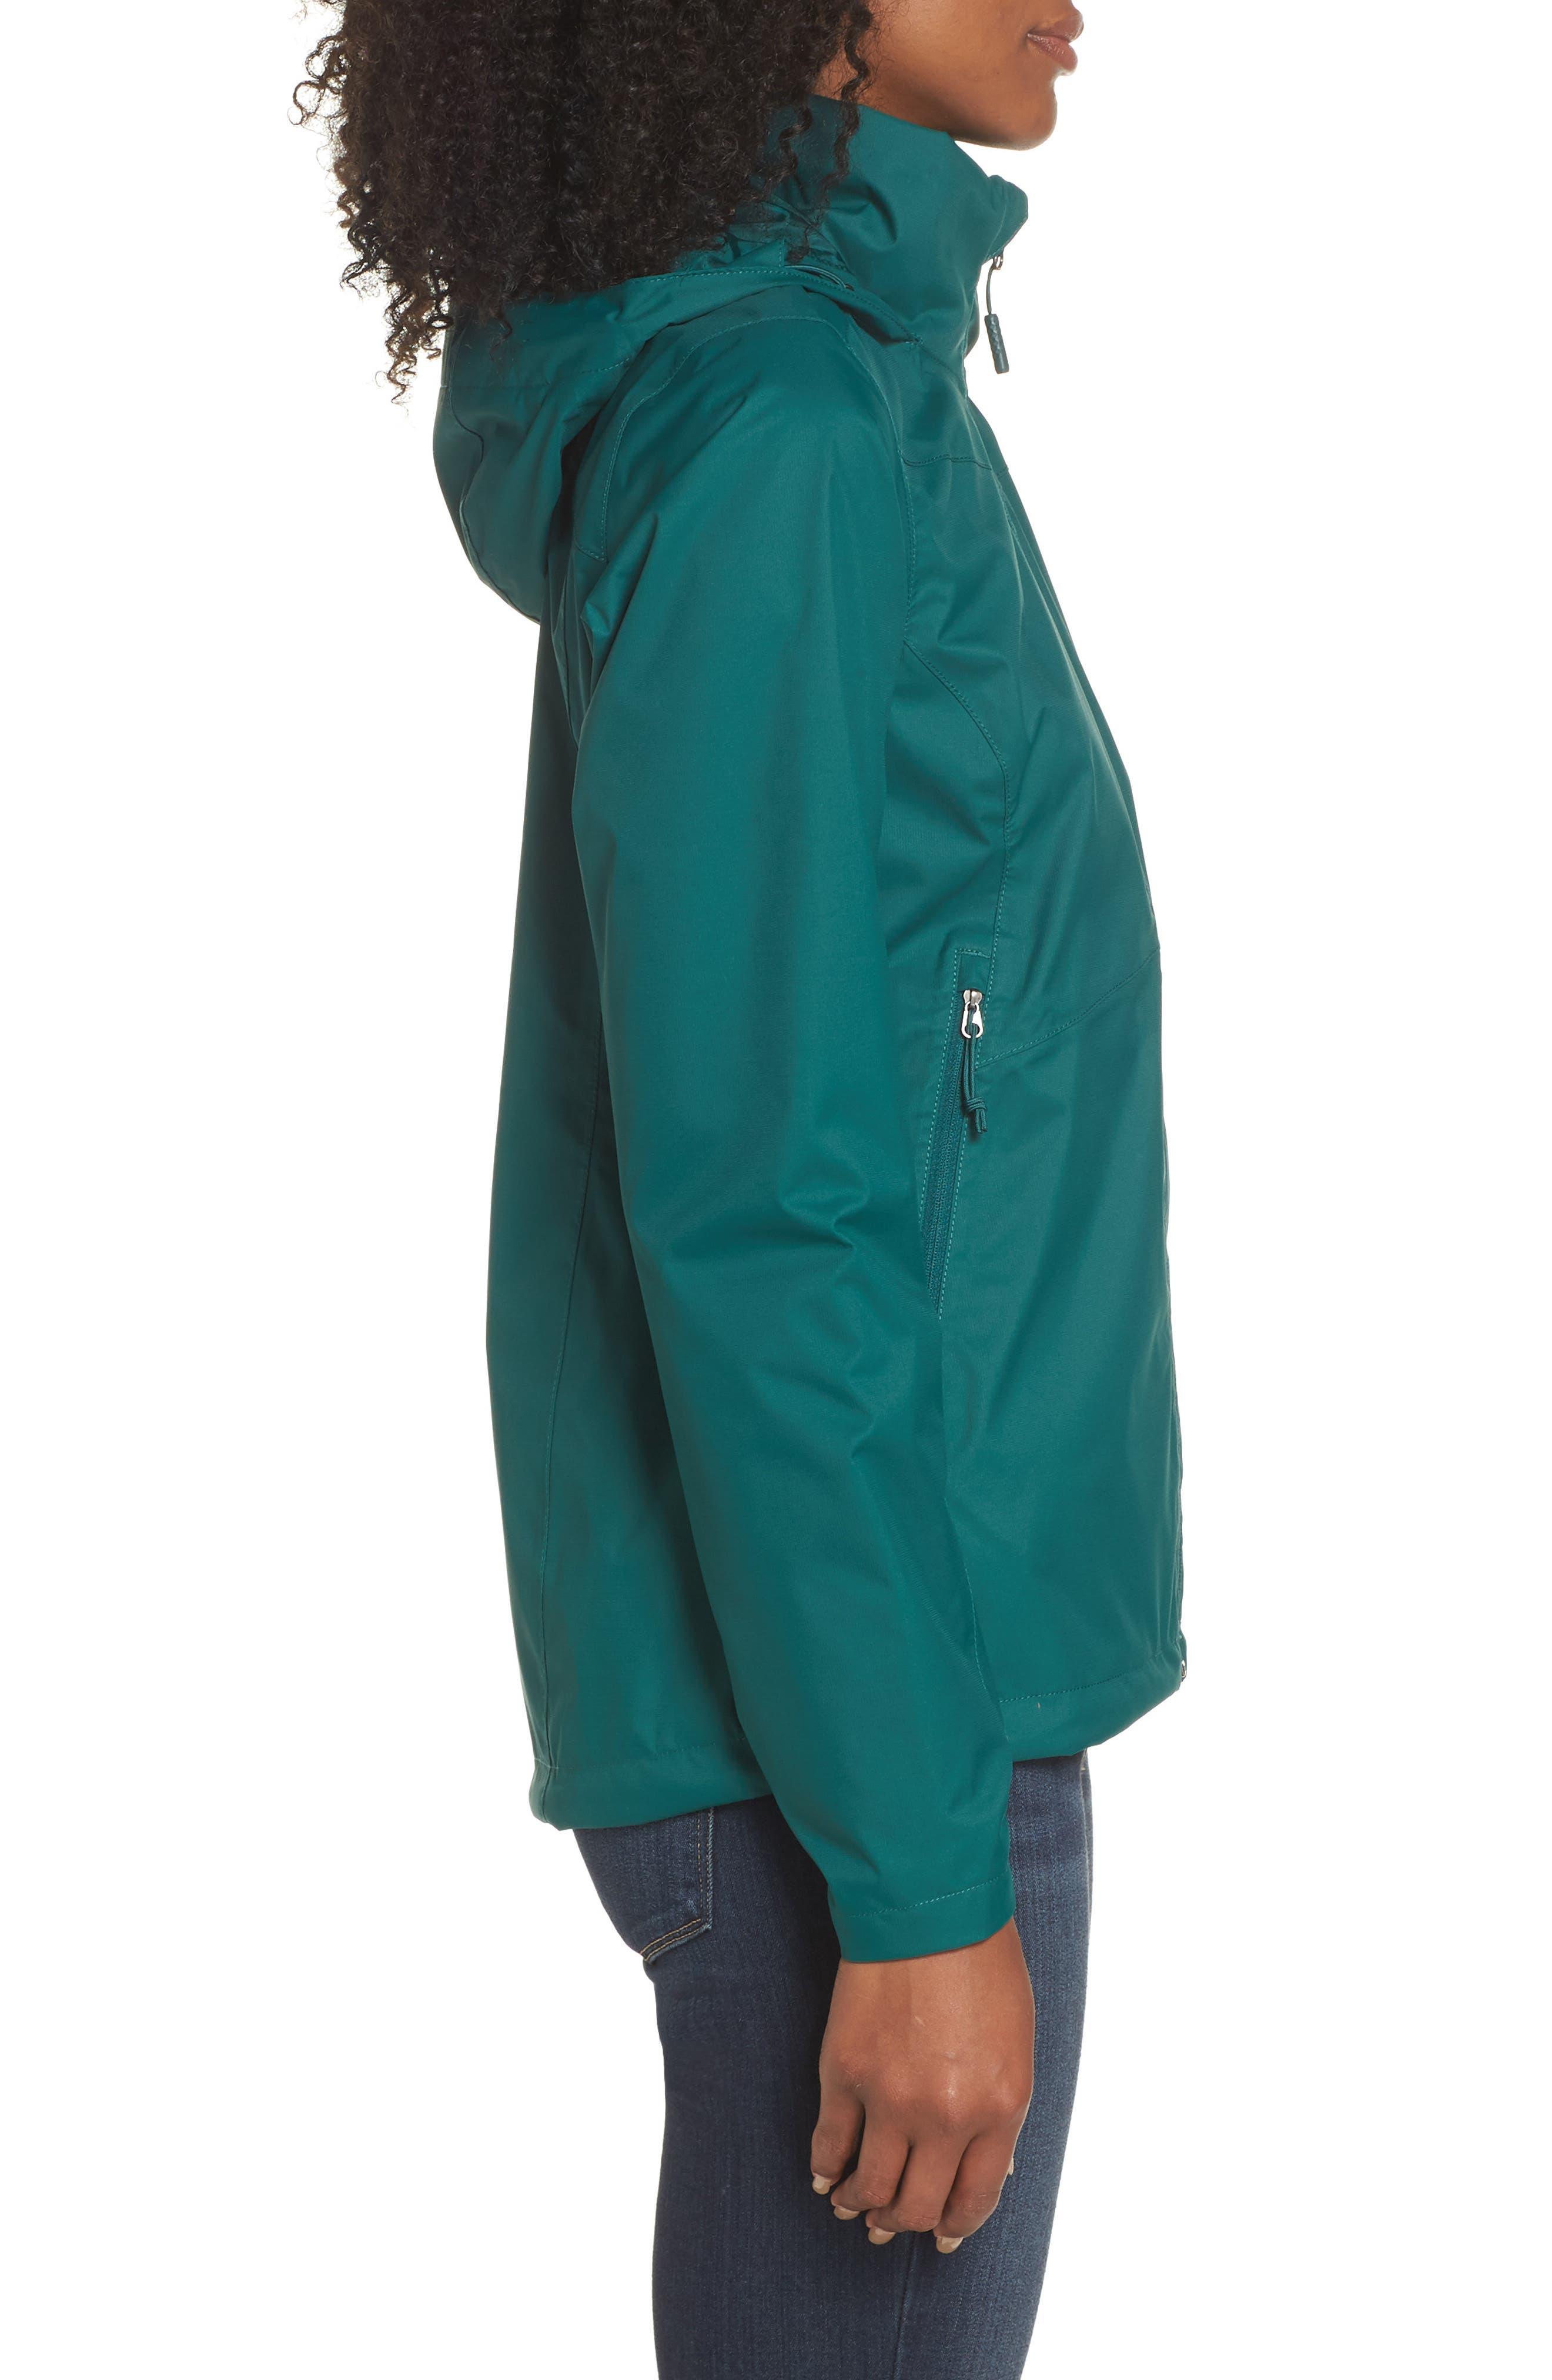 Resolve Plus Waterproof Jacket,                             Alternate thumbnail 3, color,                             BOTANICAL GREEN